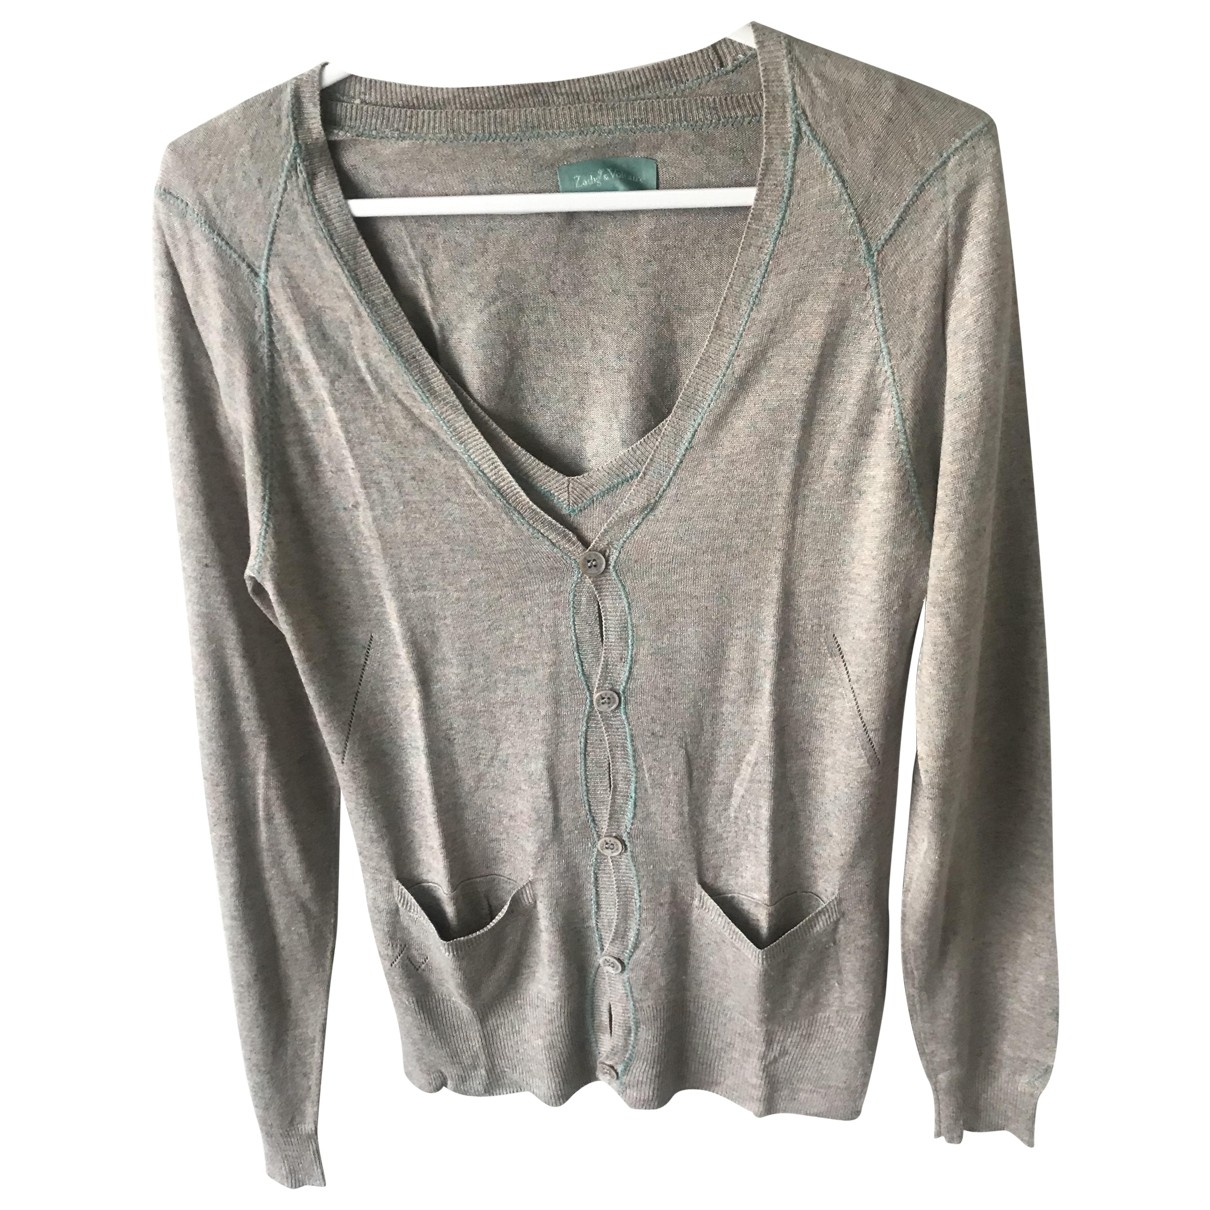 Zadig & Voltaire \N Beige Linen Knitwear for Women S International